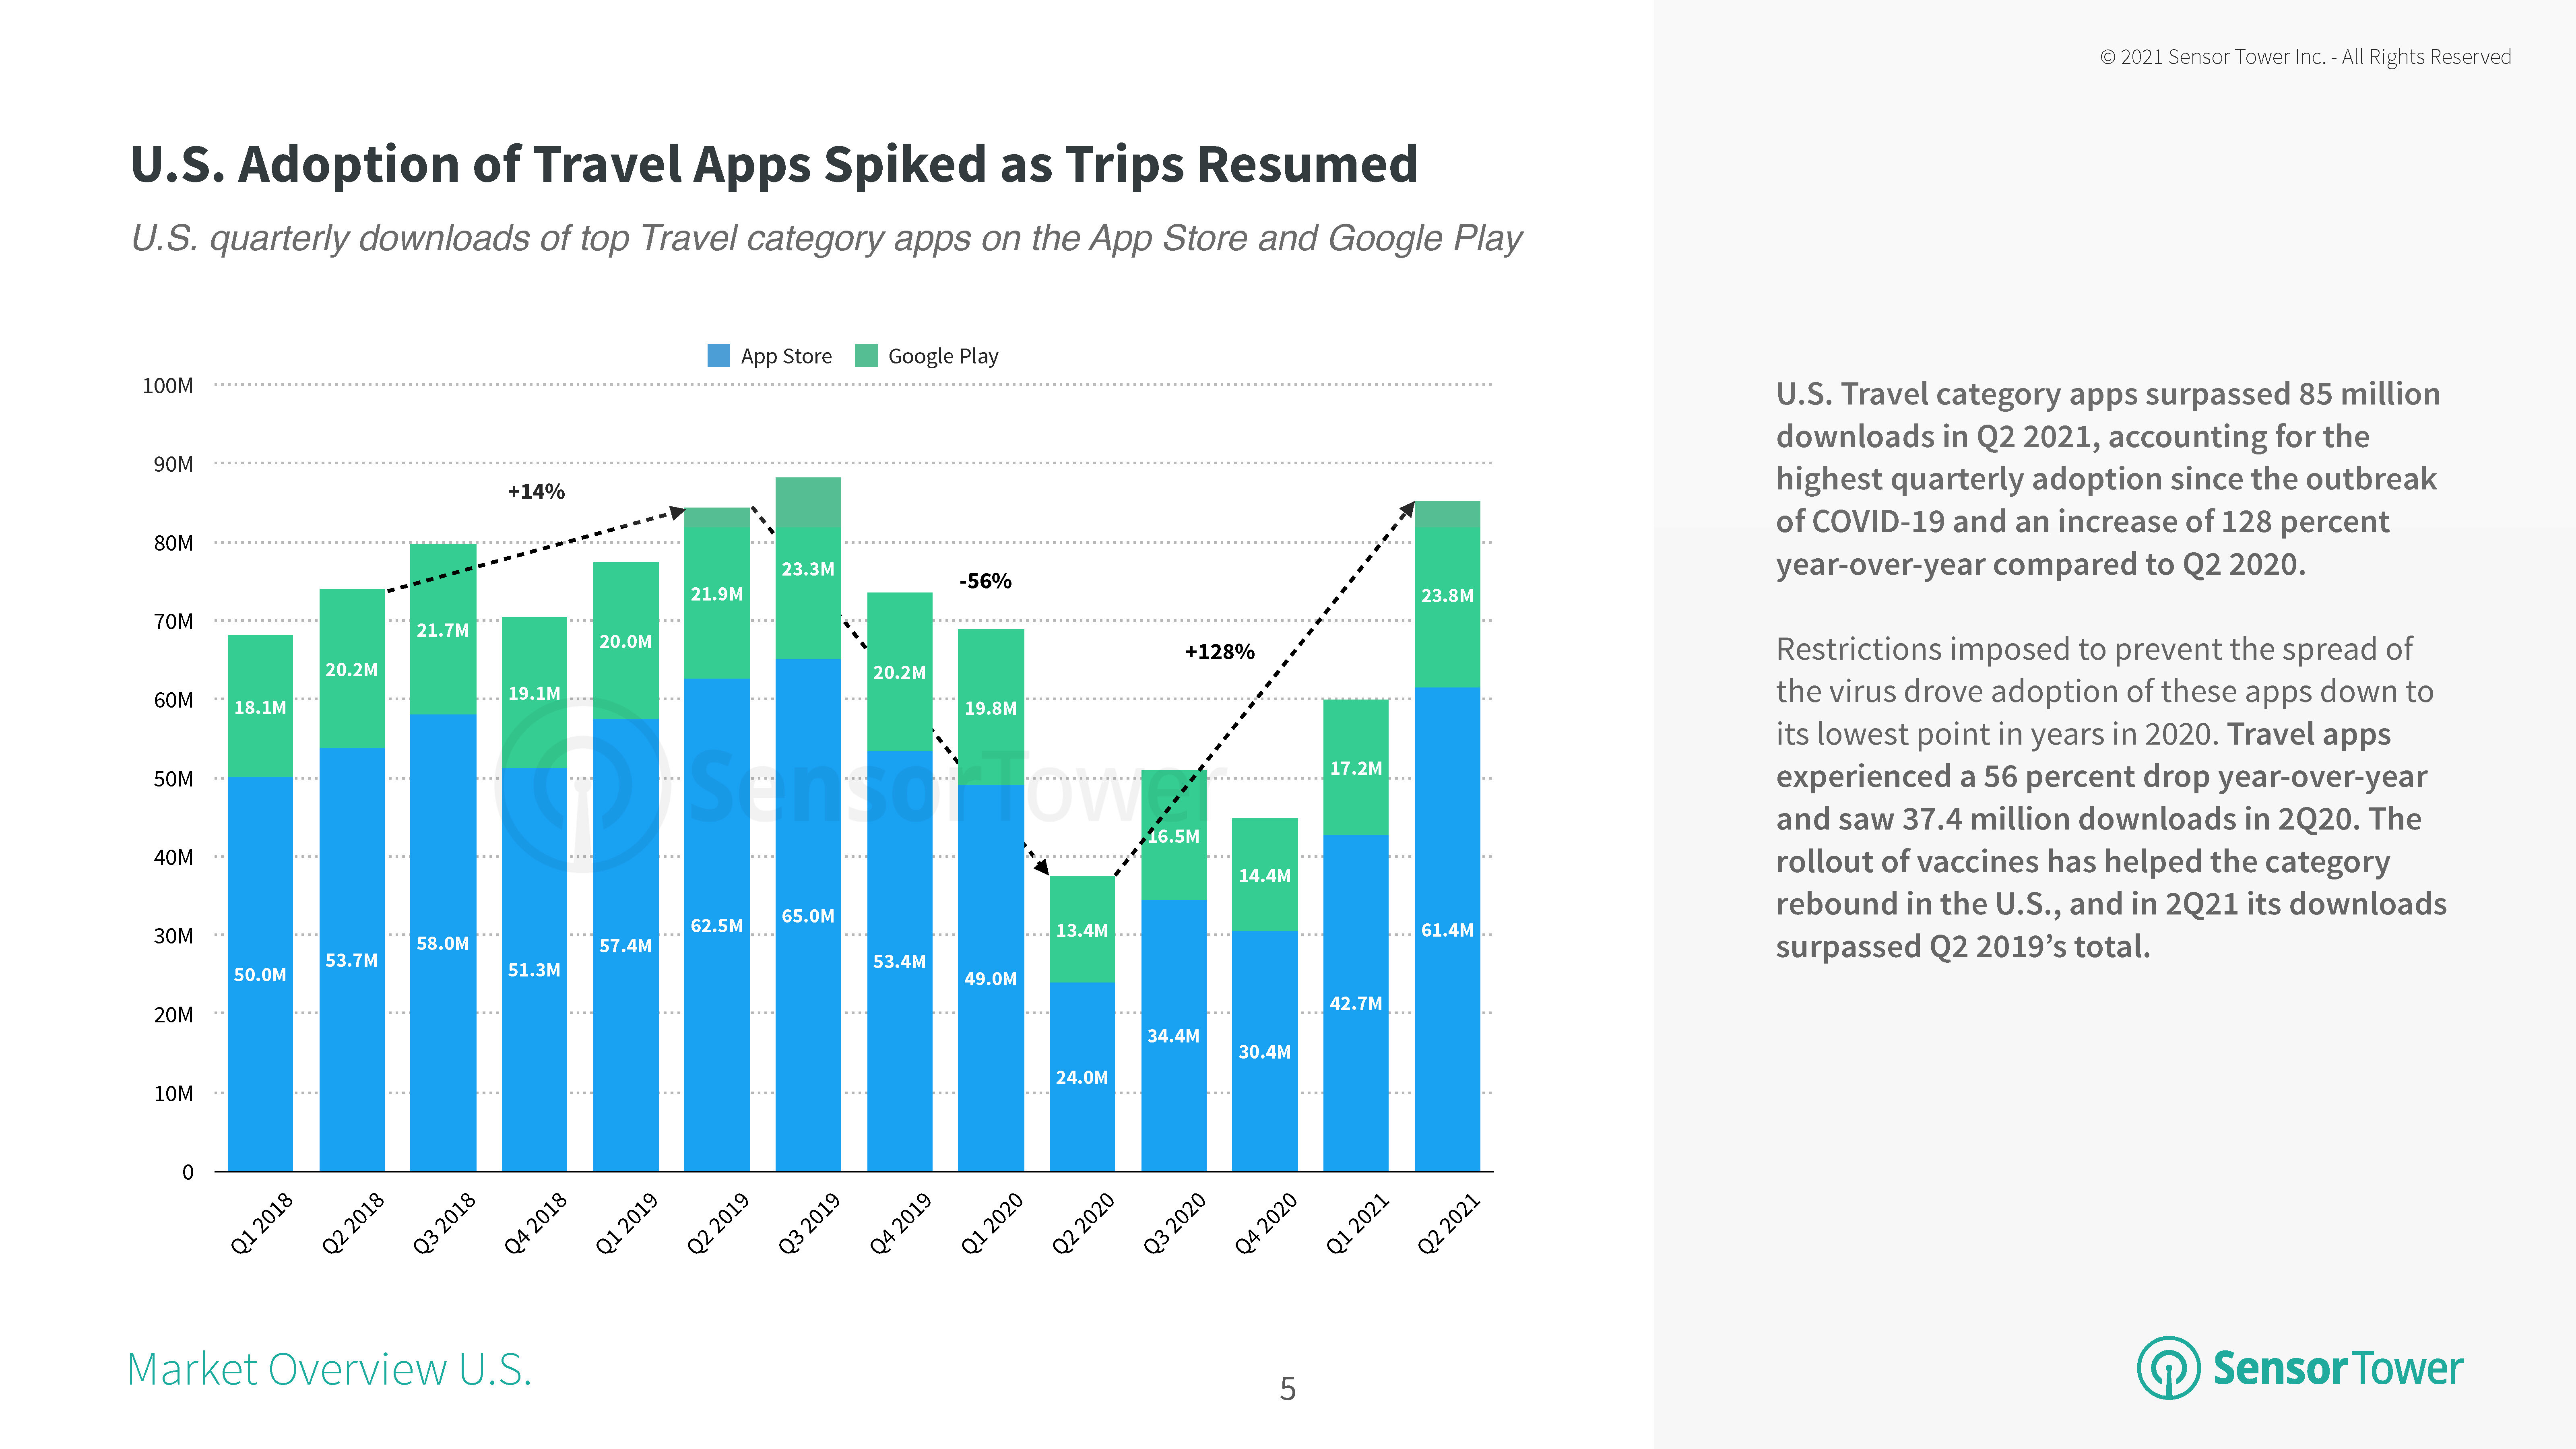 U.S. Travel Apps Surpass 85 Million Downloads